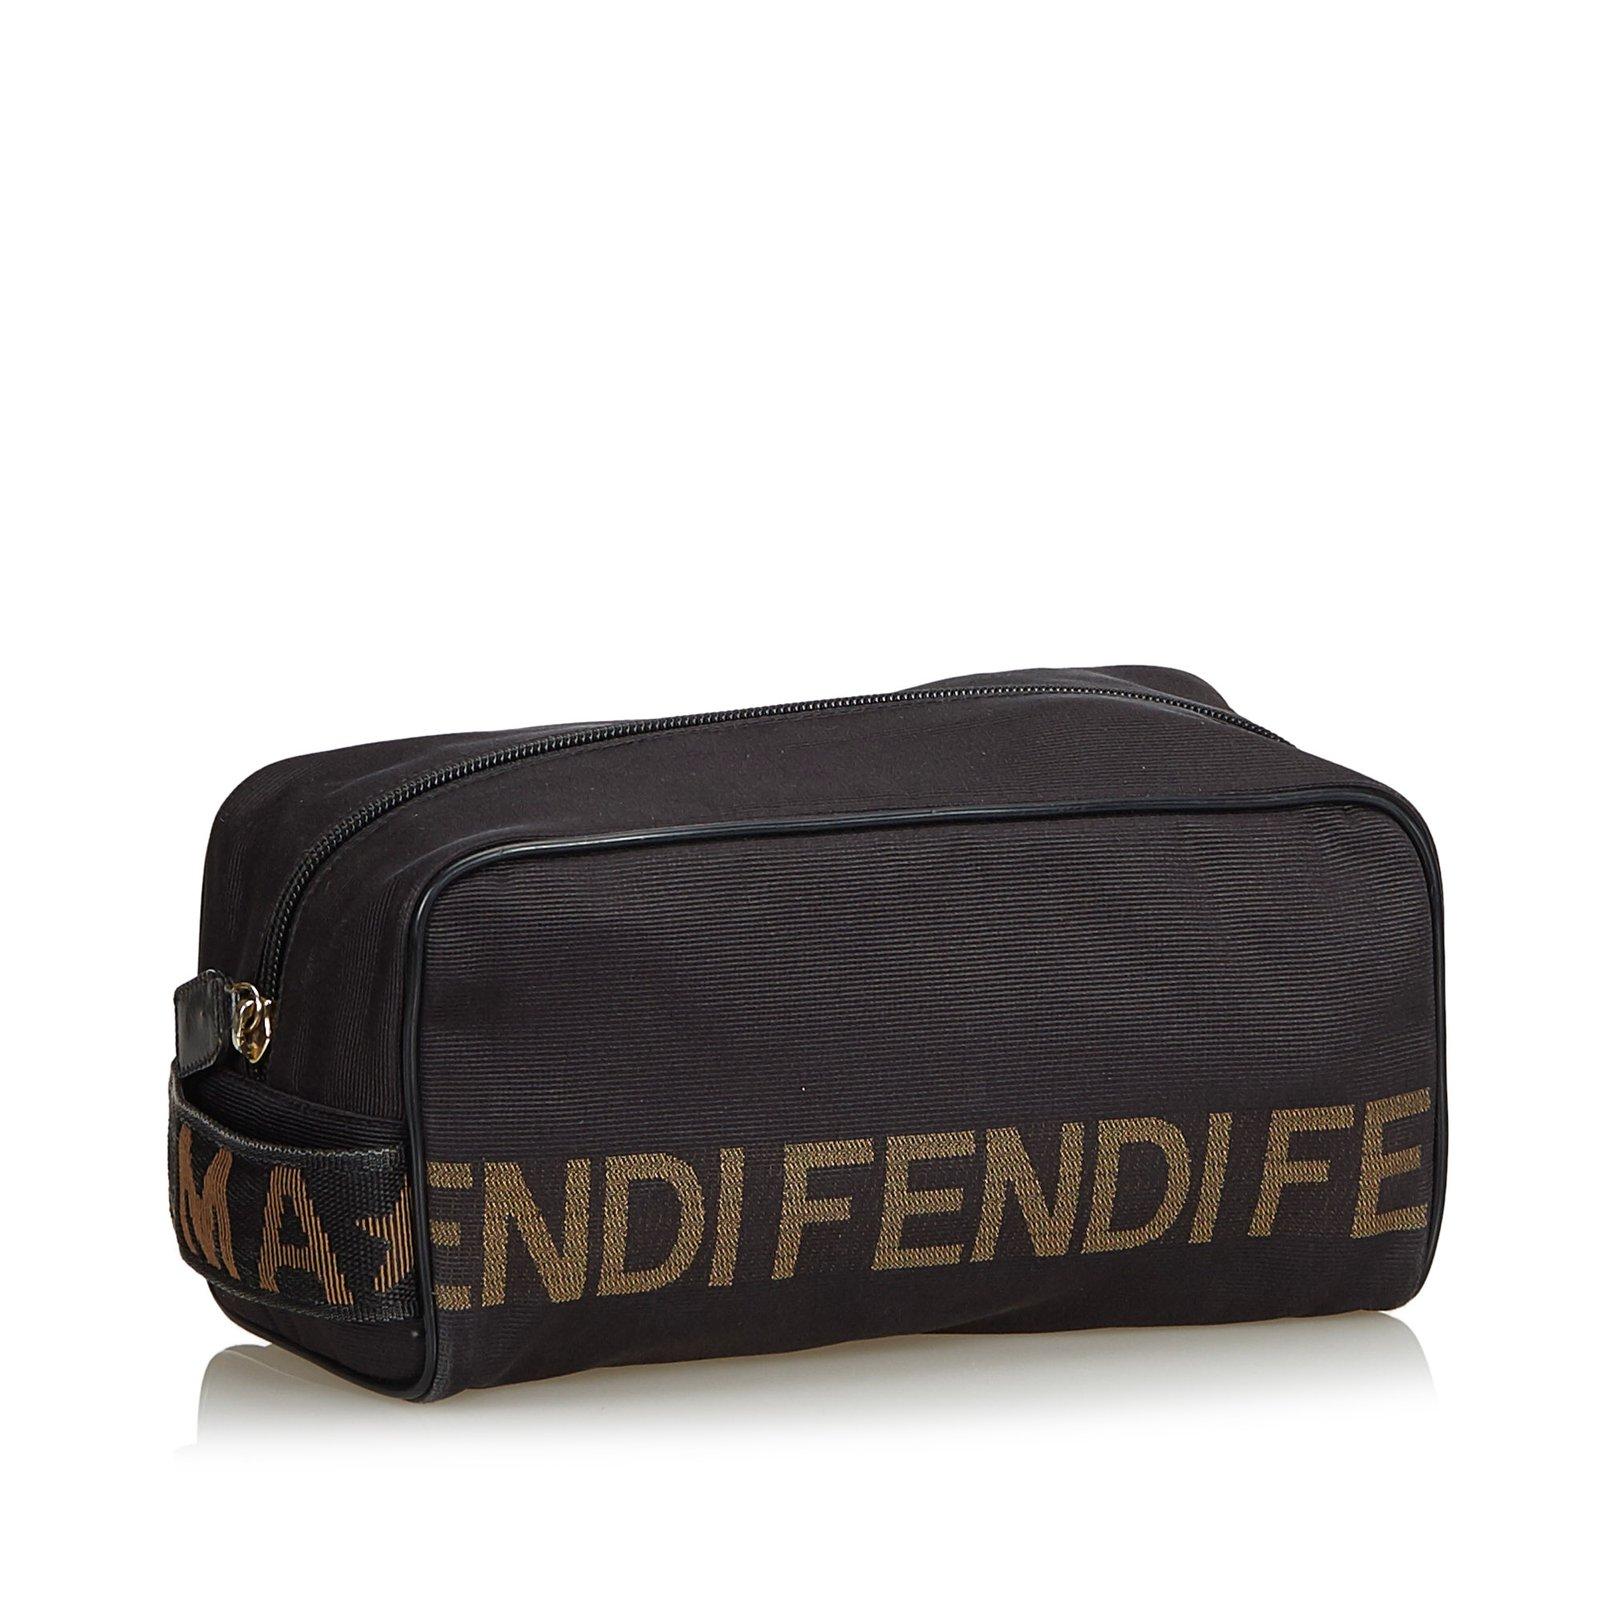 2165a7676c52 Fendi Logo Nylon Clutch Clutch bags Nylon